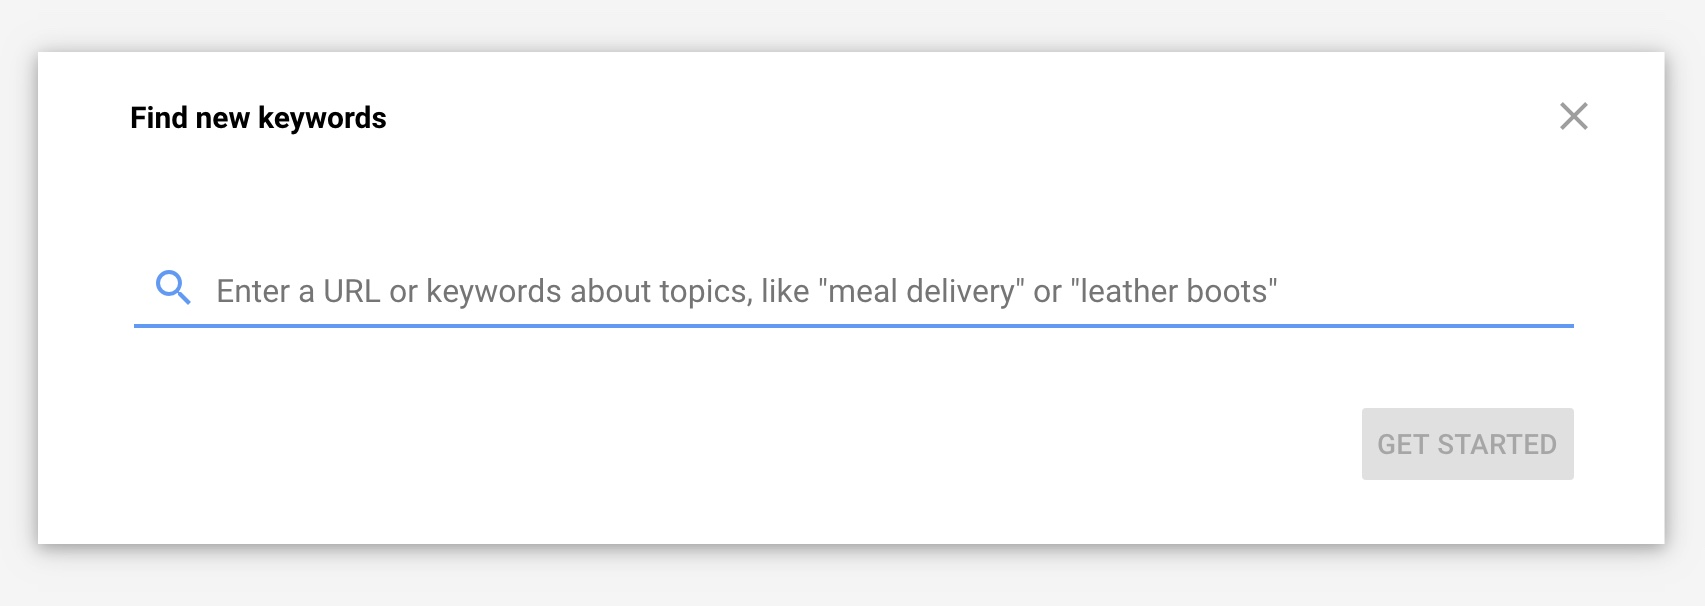 Find new keywords with Google Keyword Planner - VitalStorm